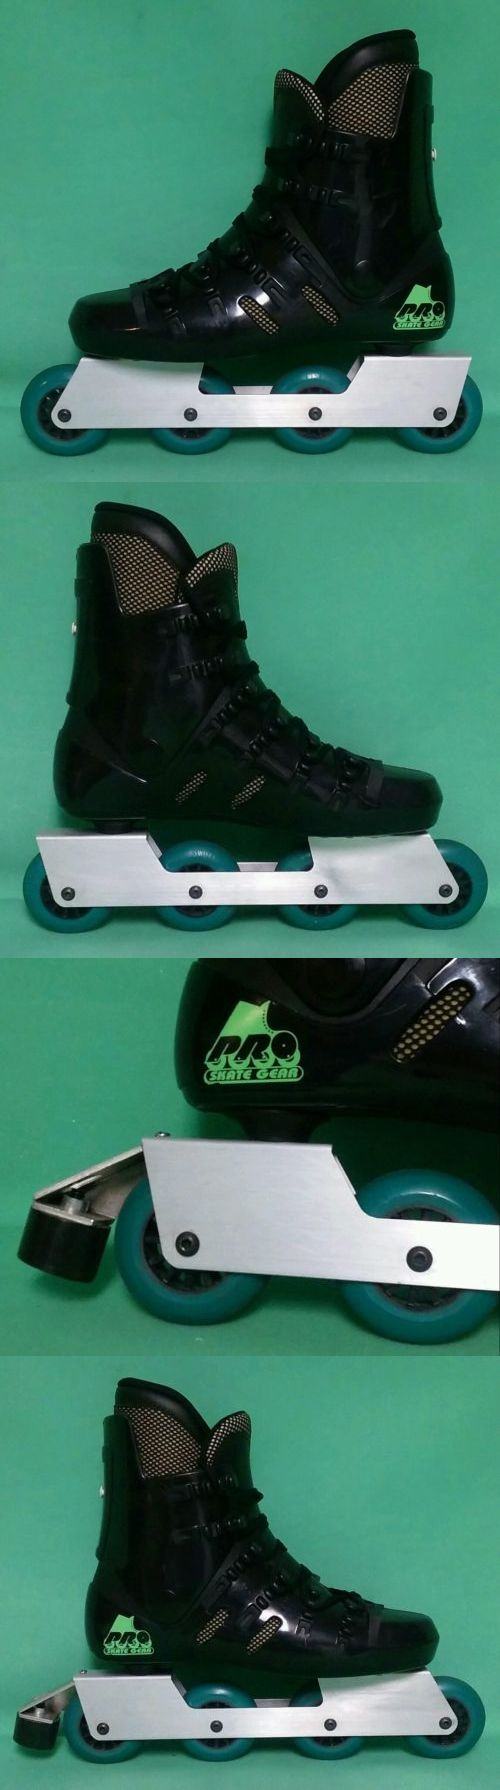 Men 47346: New 80 S Retro Pro Skate Gear Hard Boot Inline Sz 9.5(43) Vintage -> BUY IT NOW ONLY: $78.99 on eBay!